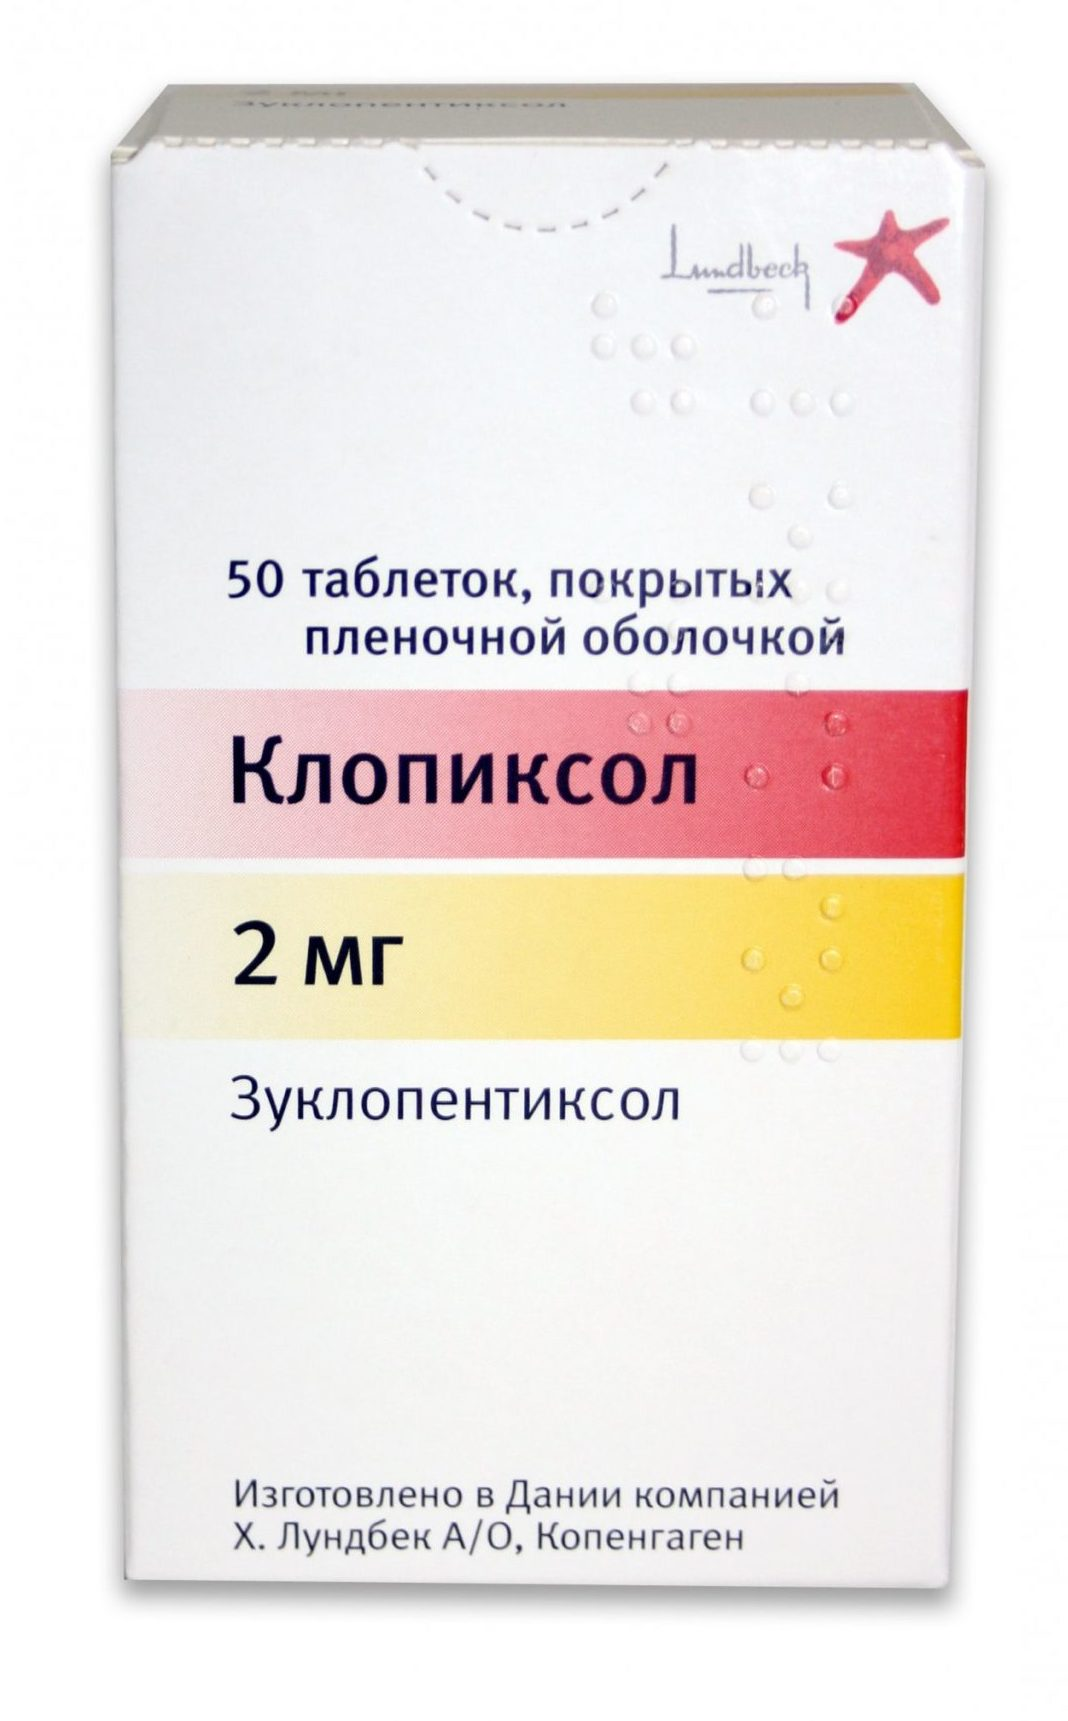 klopiksol-2mg